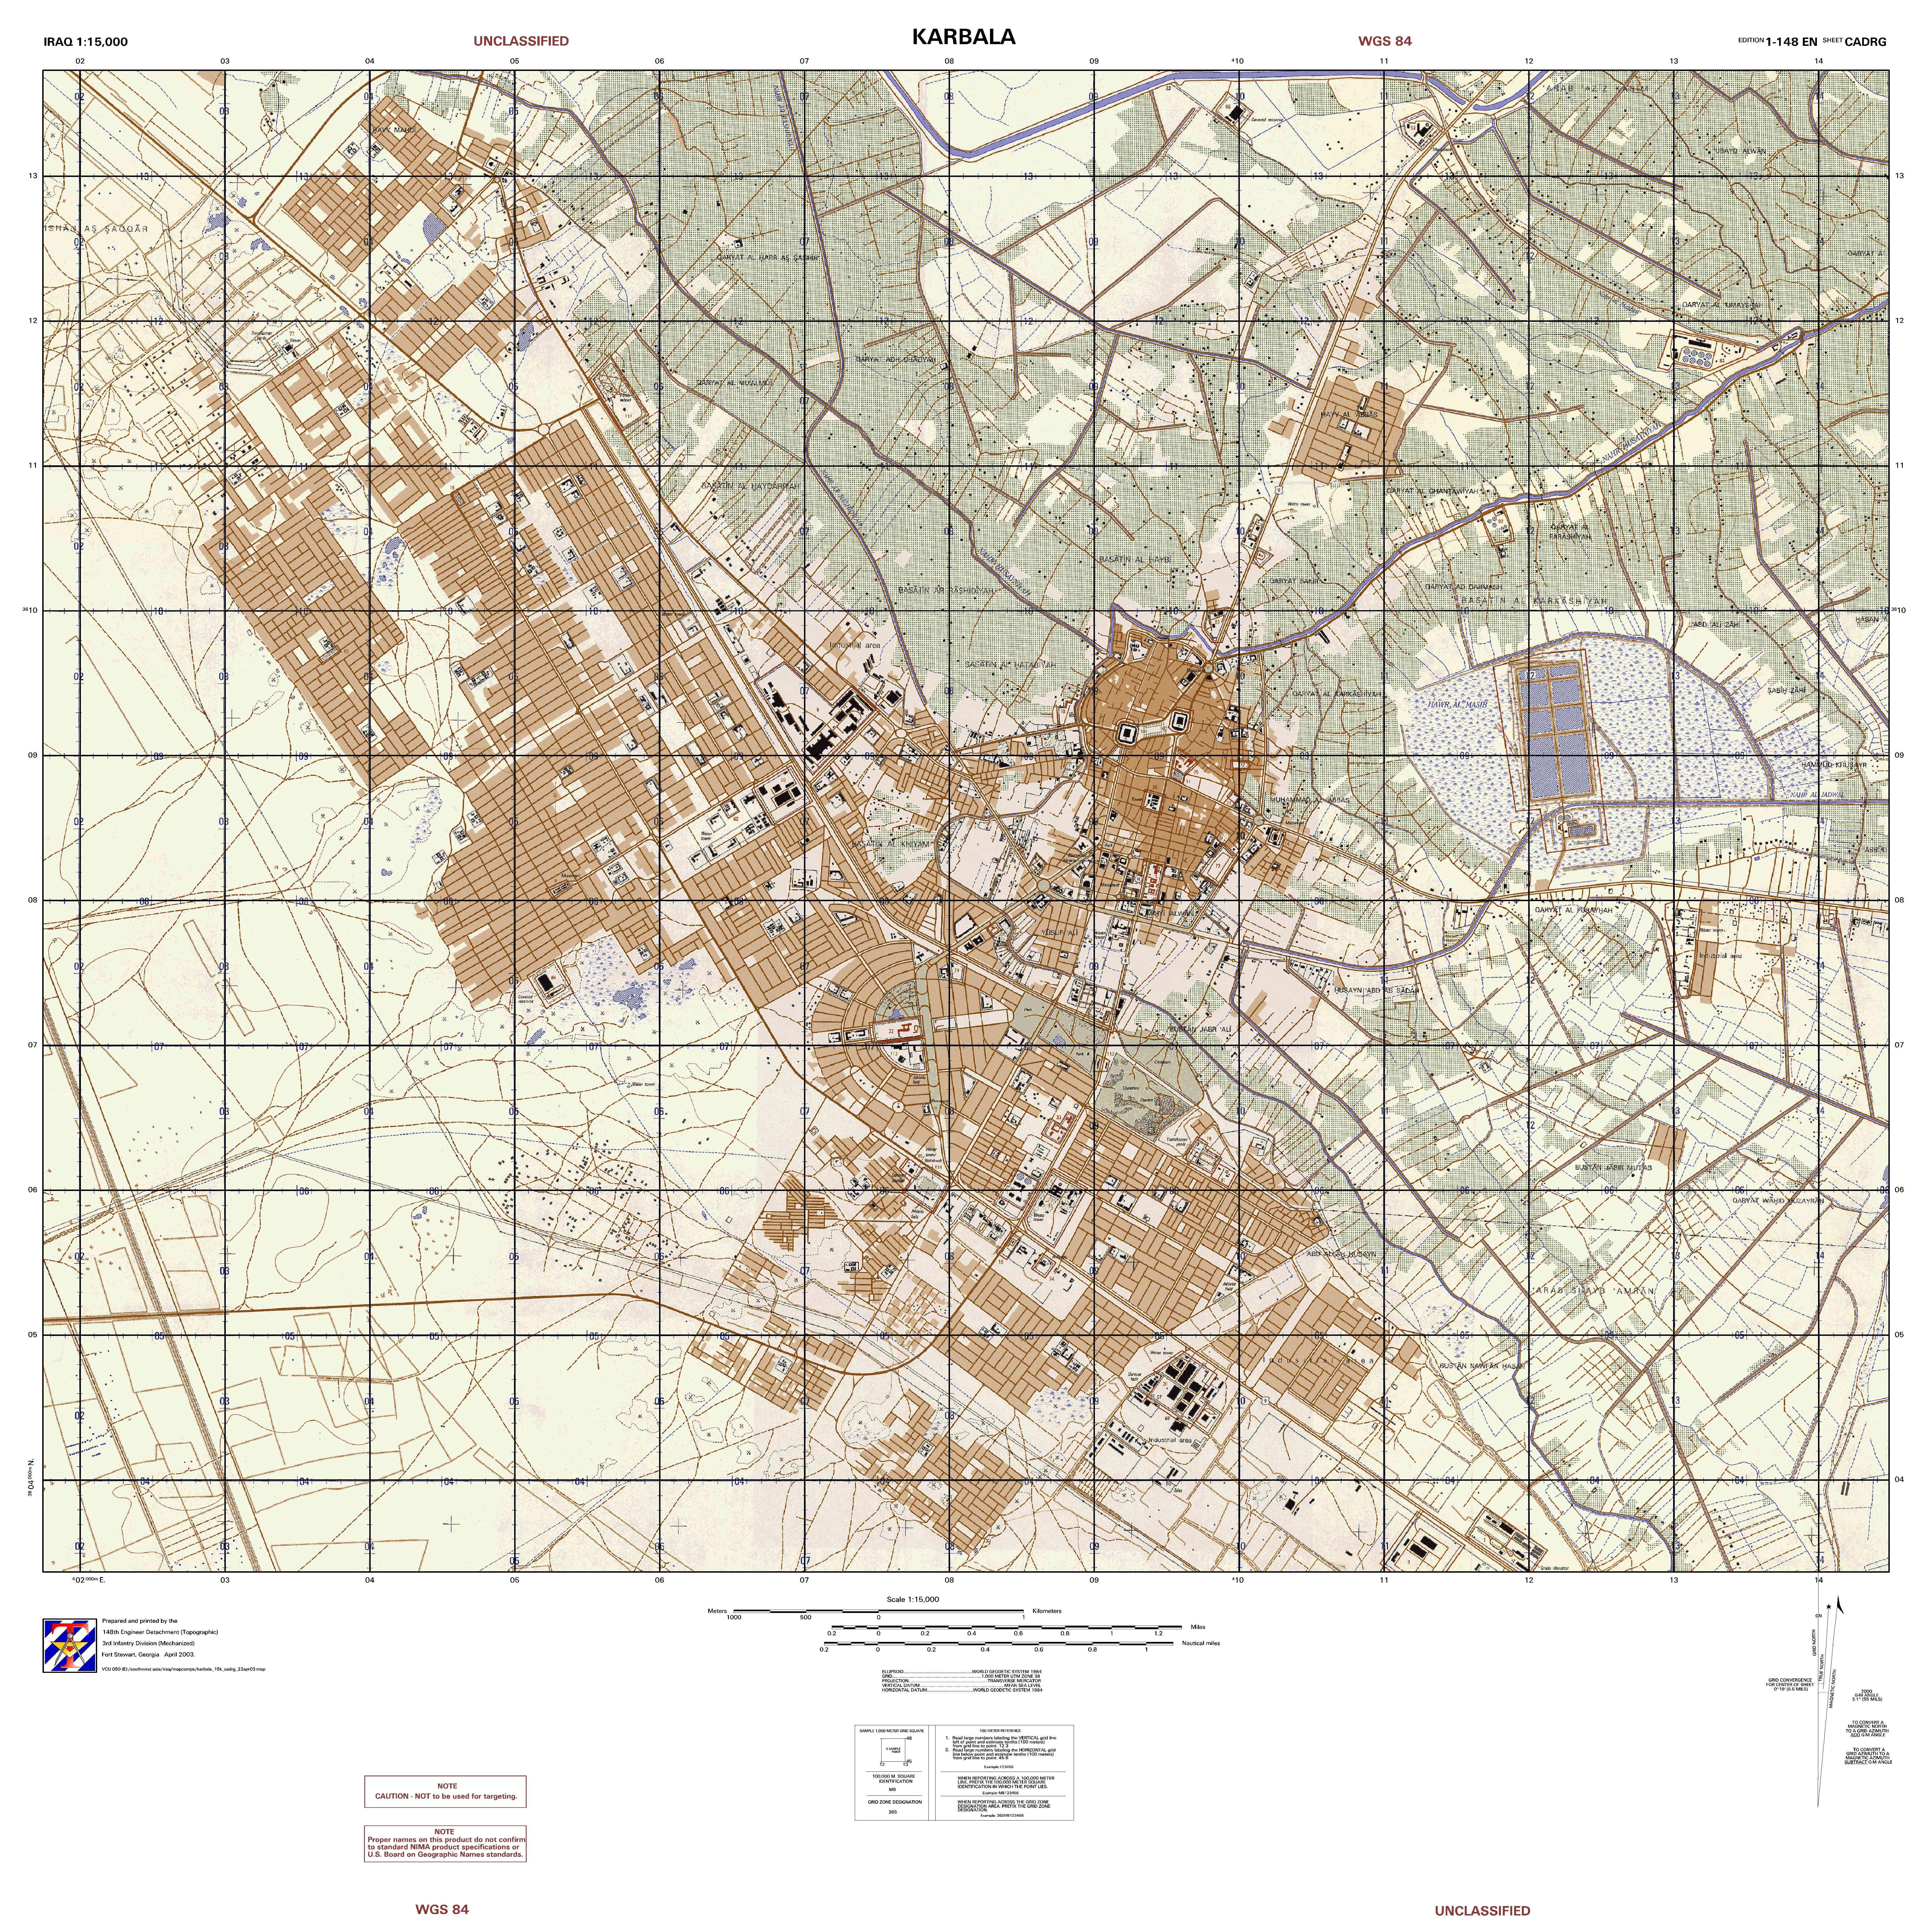 Kerbala Isiah Thomas Photos - Map of us bases in iraq